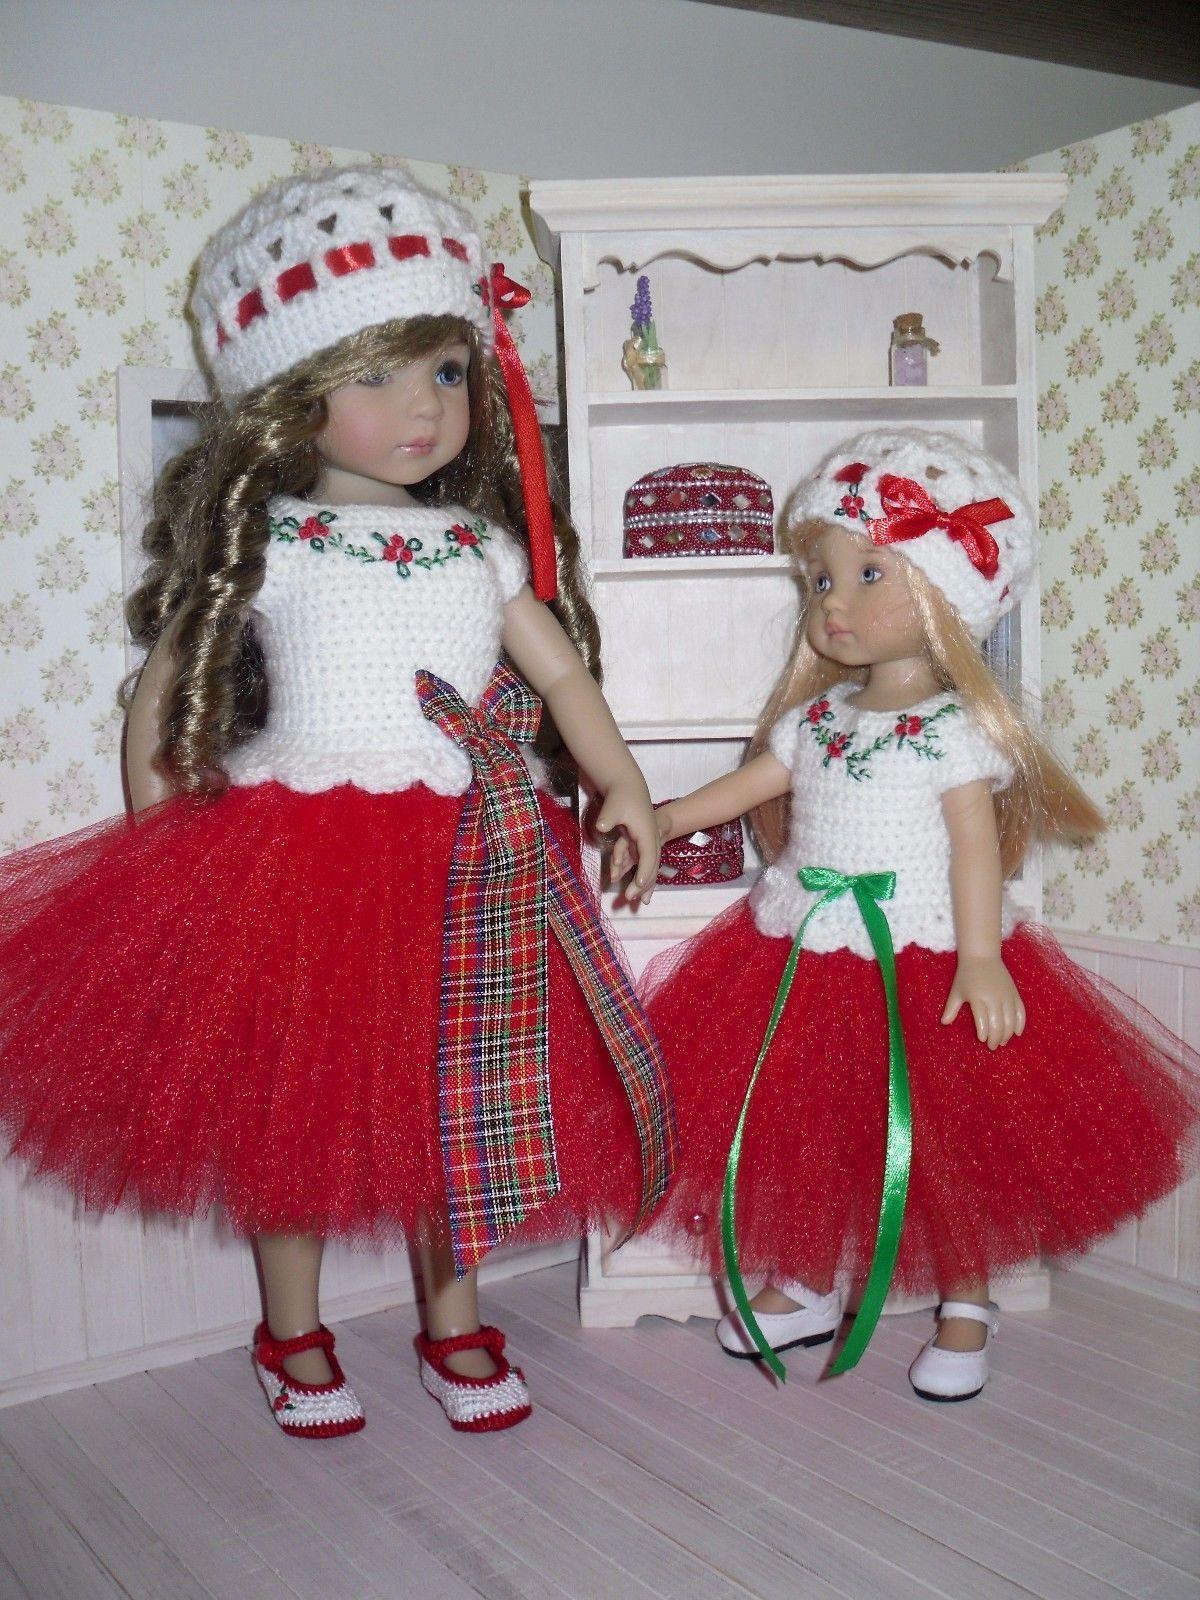 Set for Dianna Effner Little Darling Boneka 10 inches doll - blouse, skirt, hat. | eBay!